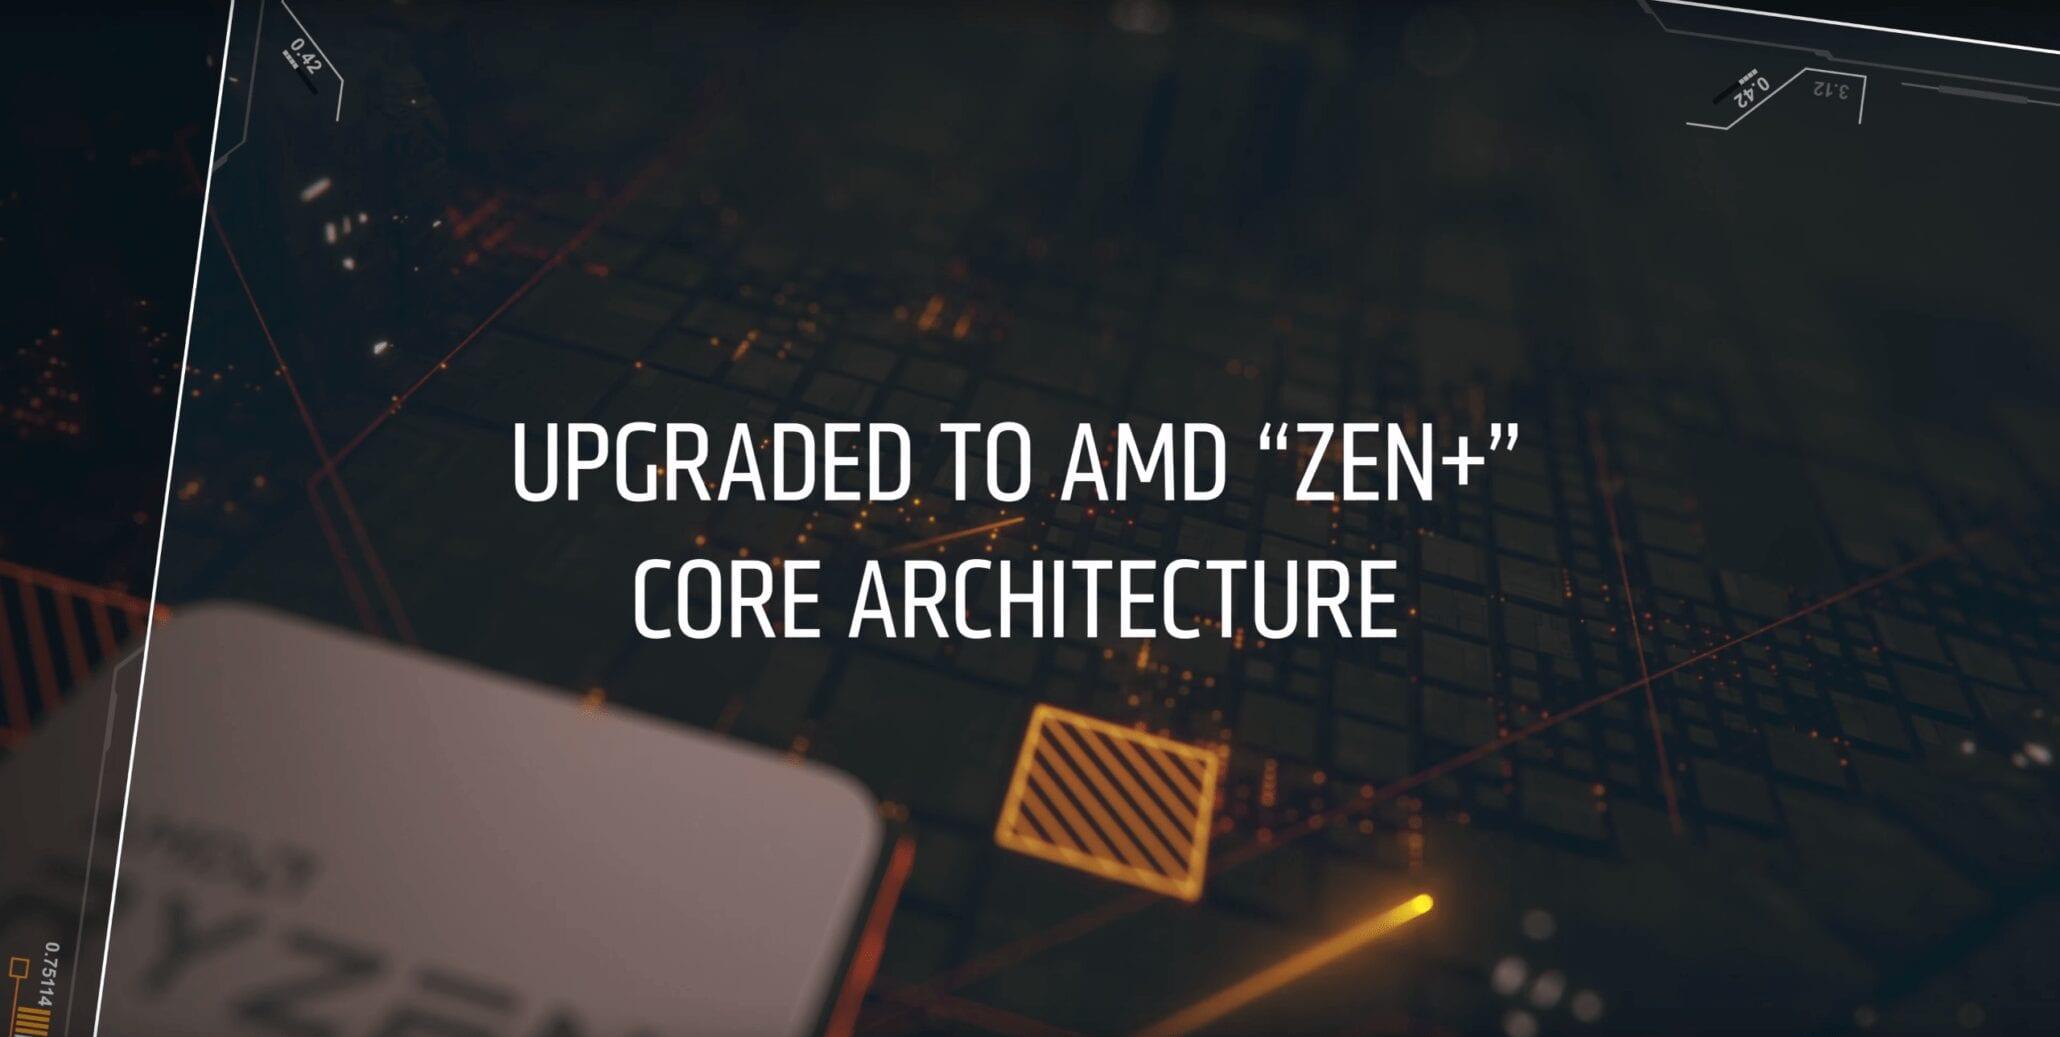 AMD upgrades Ryzen 3 1200 chip to 12nm process technology